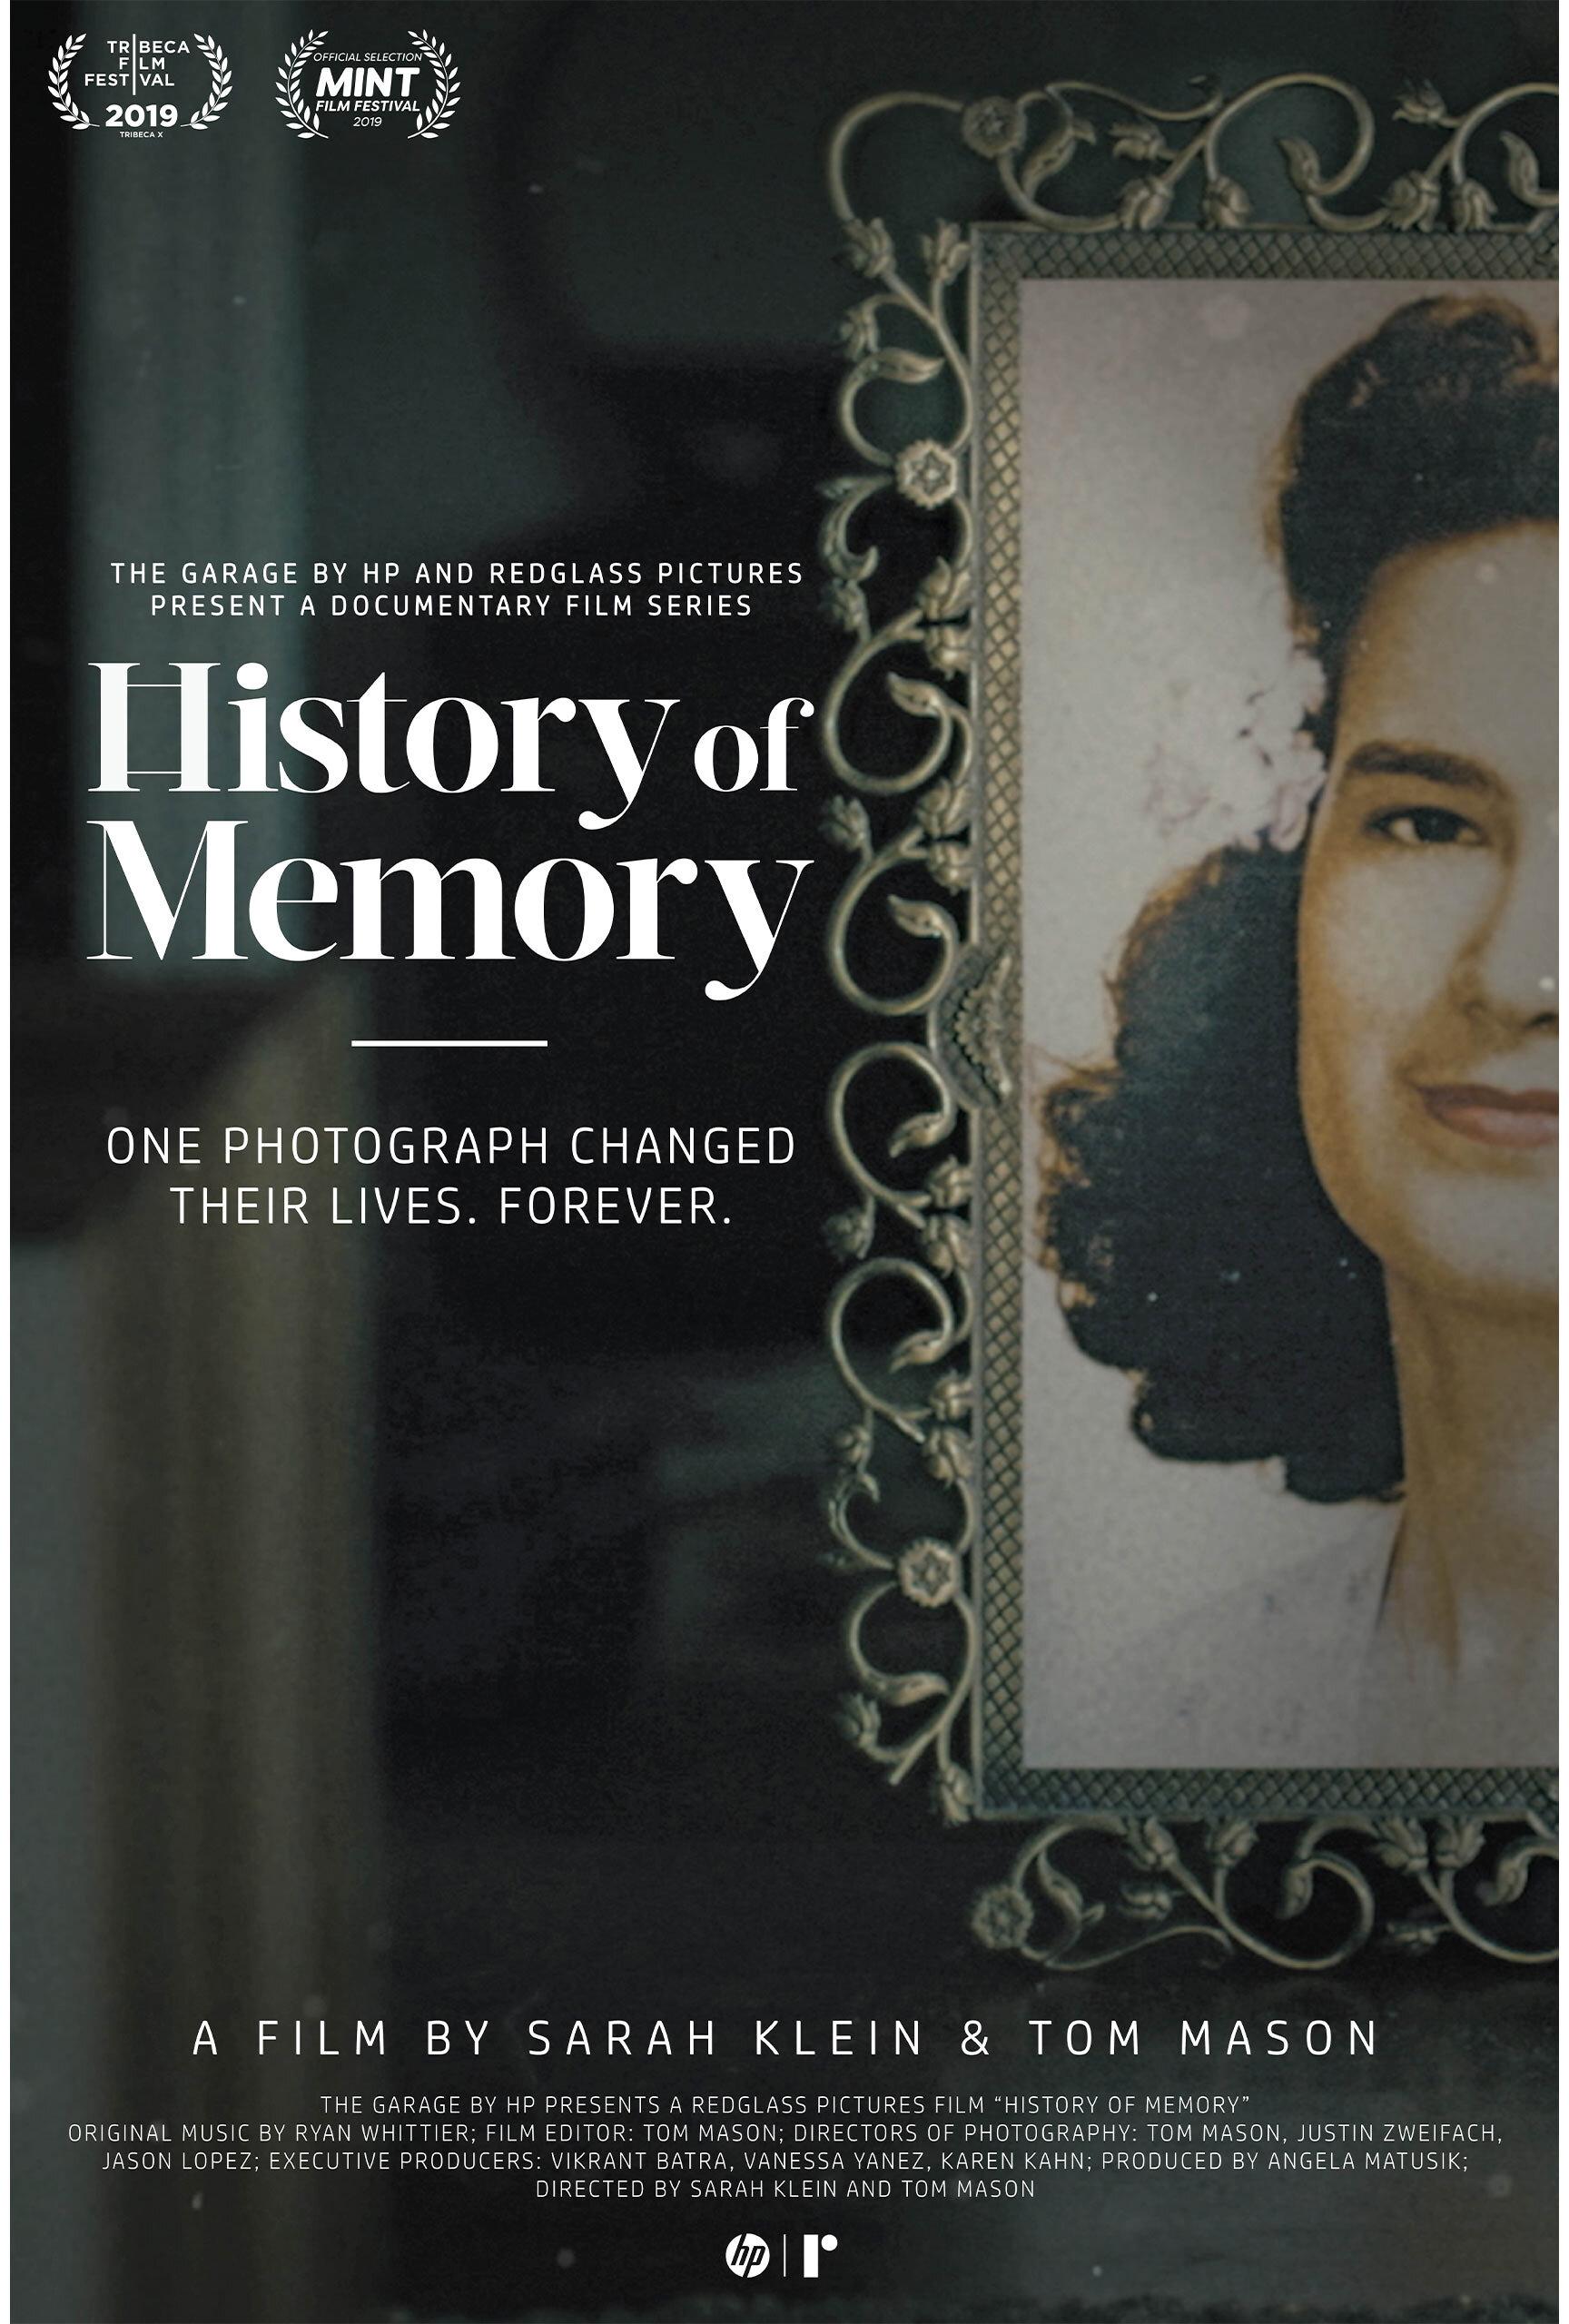 history-of-memory-poster-web.jpg